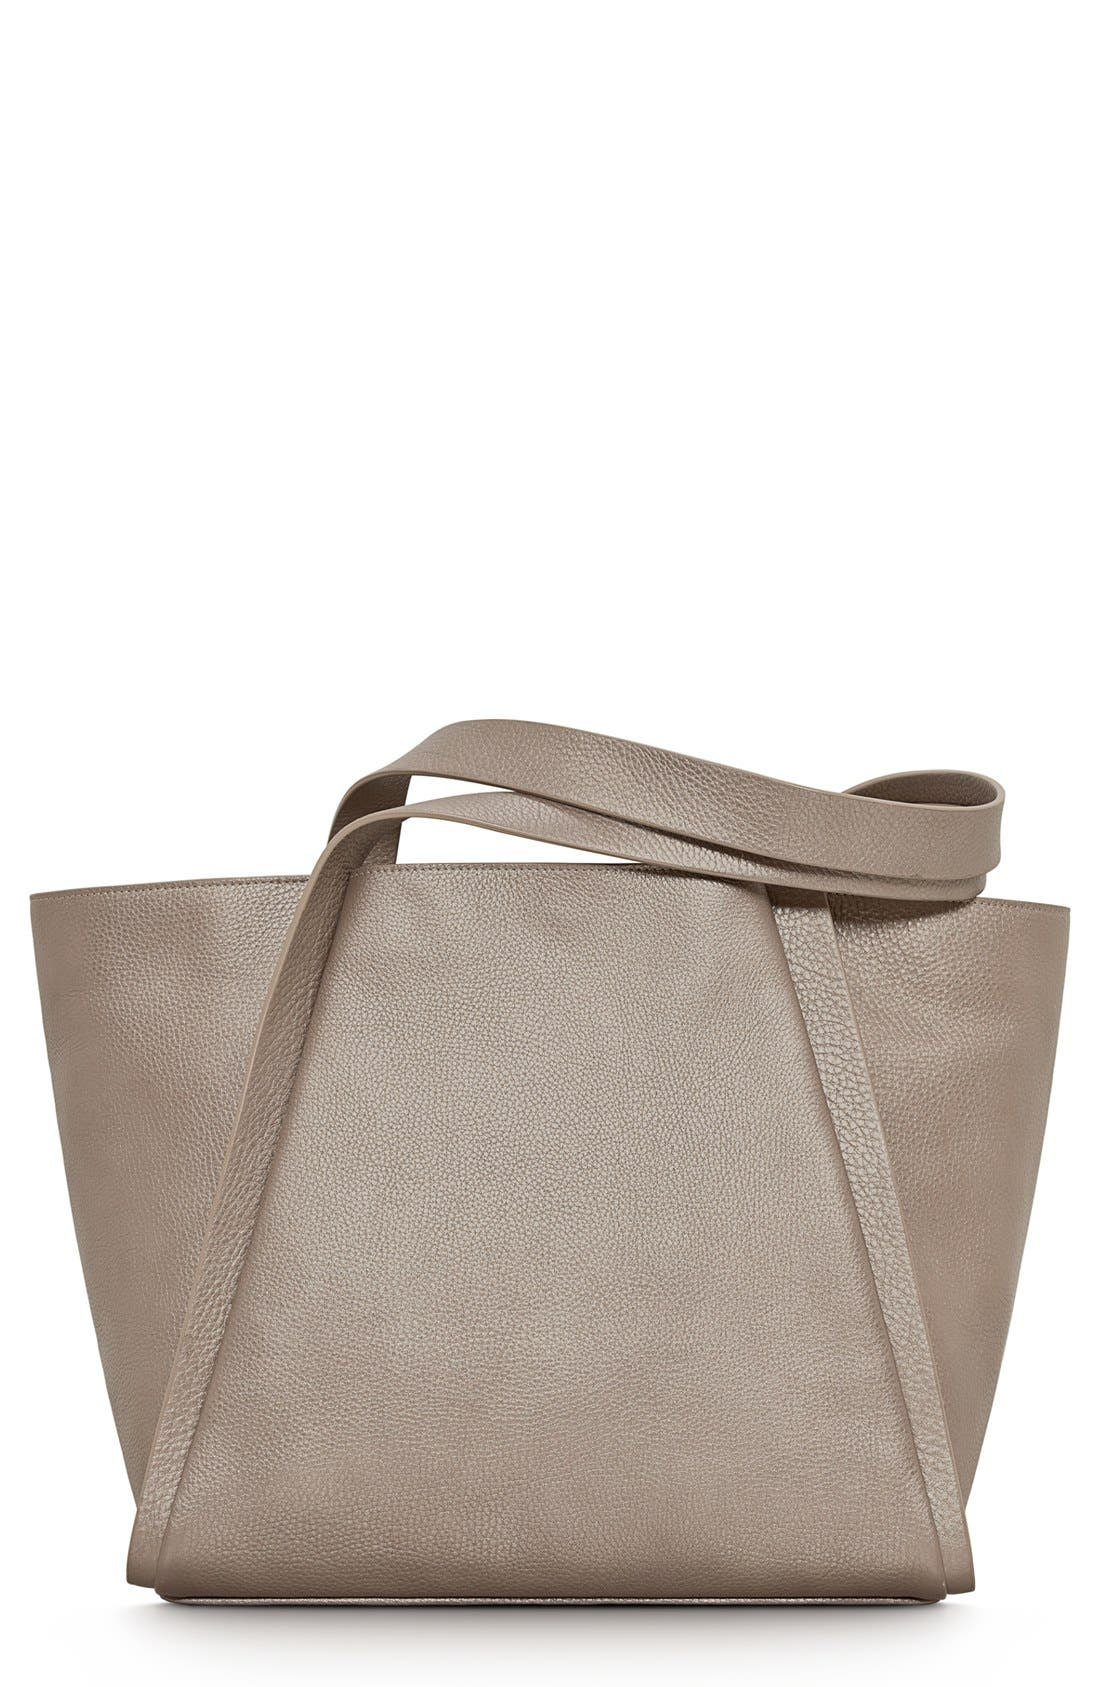 Main Image - Akris 'Medium Alex' Metallic Leather Shopper